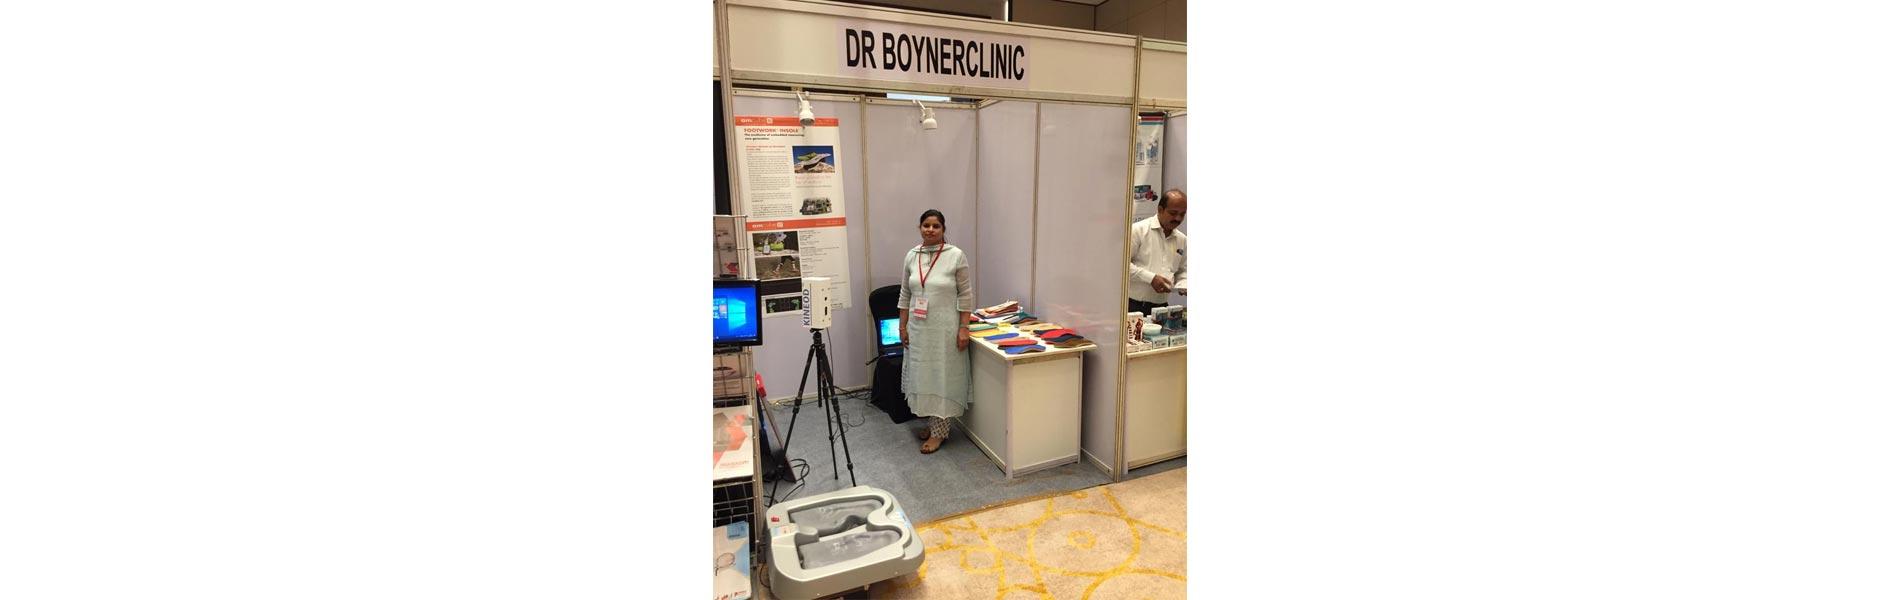 DR BOYNER CLINIC PVT LTD